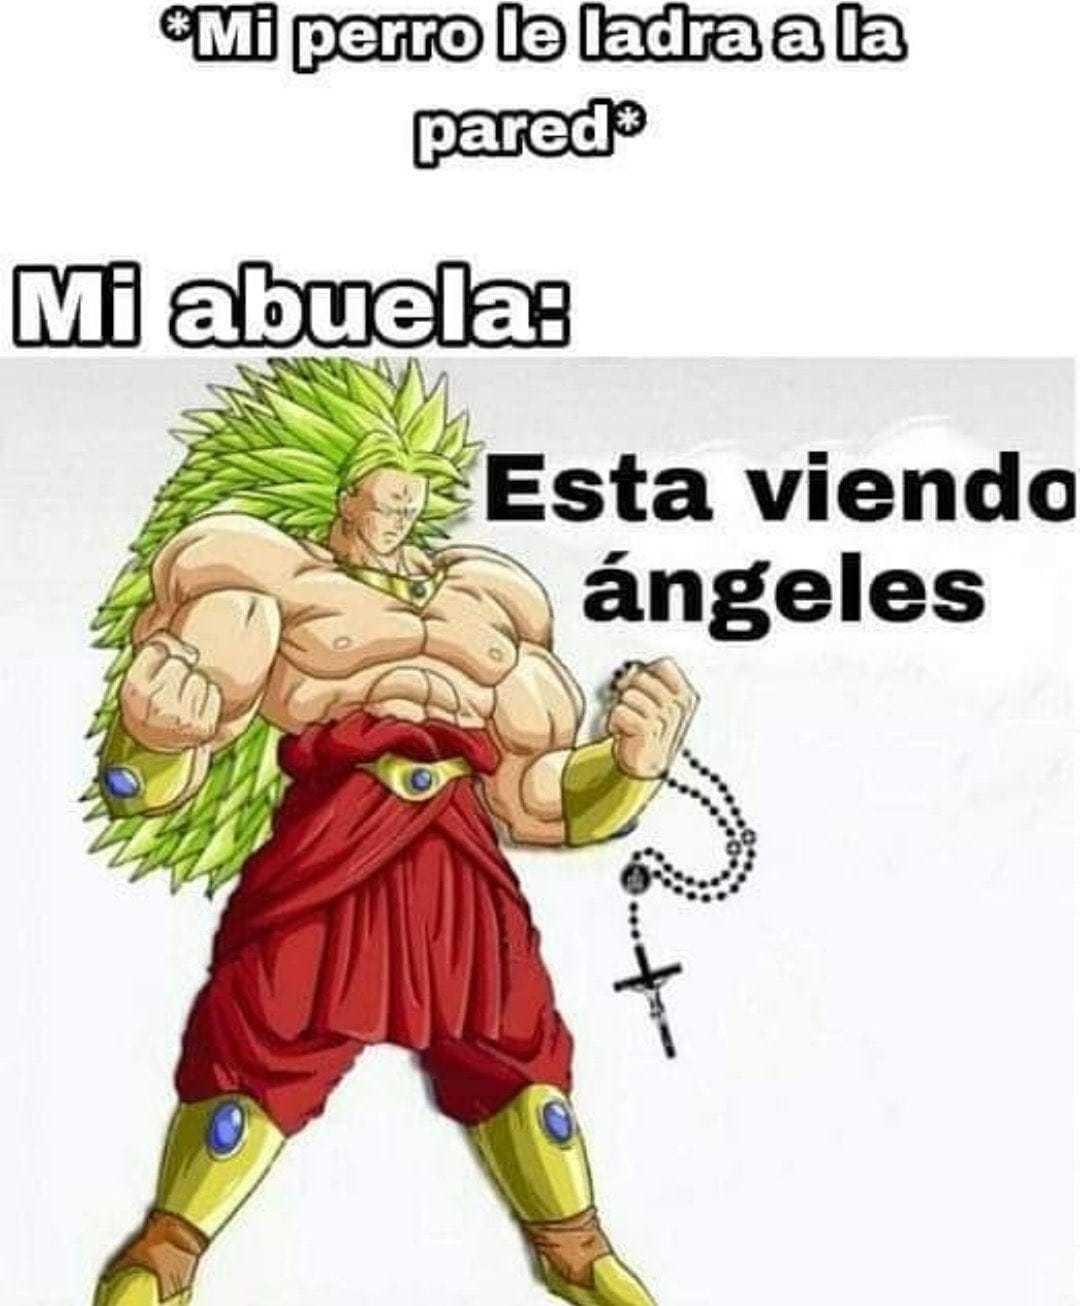 Típico de abuelitas latinas - meme